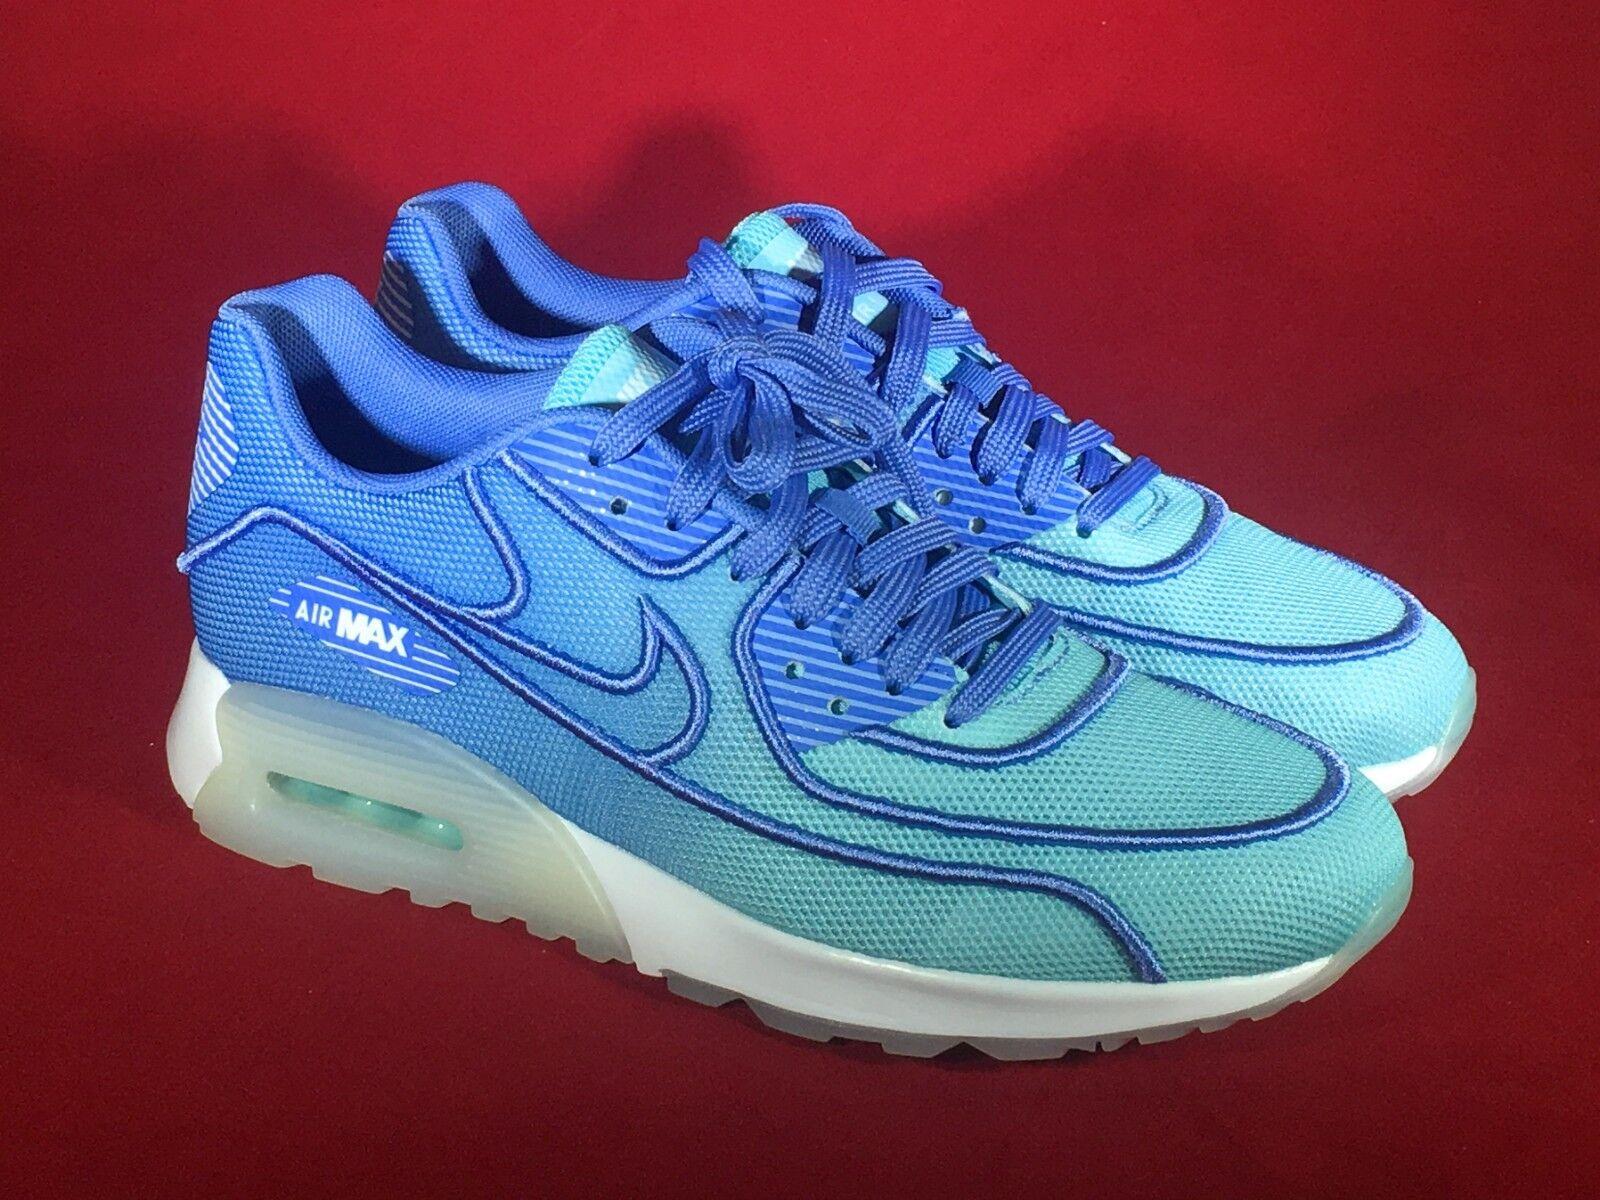 Nike Air Max 90 Ultra 2.0 Breathe Polarized 87 1 bluee 917523-400 Women's Sz 7.5